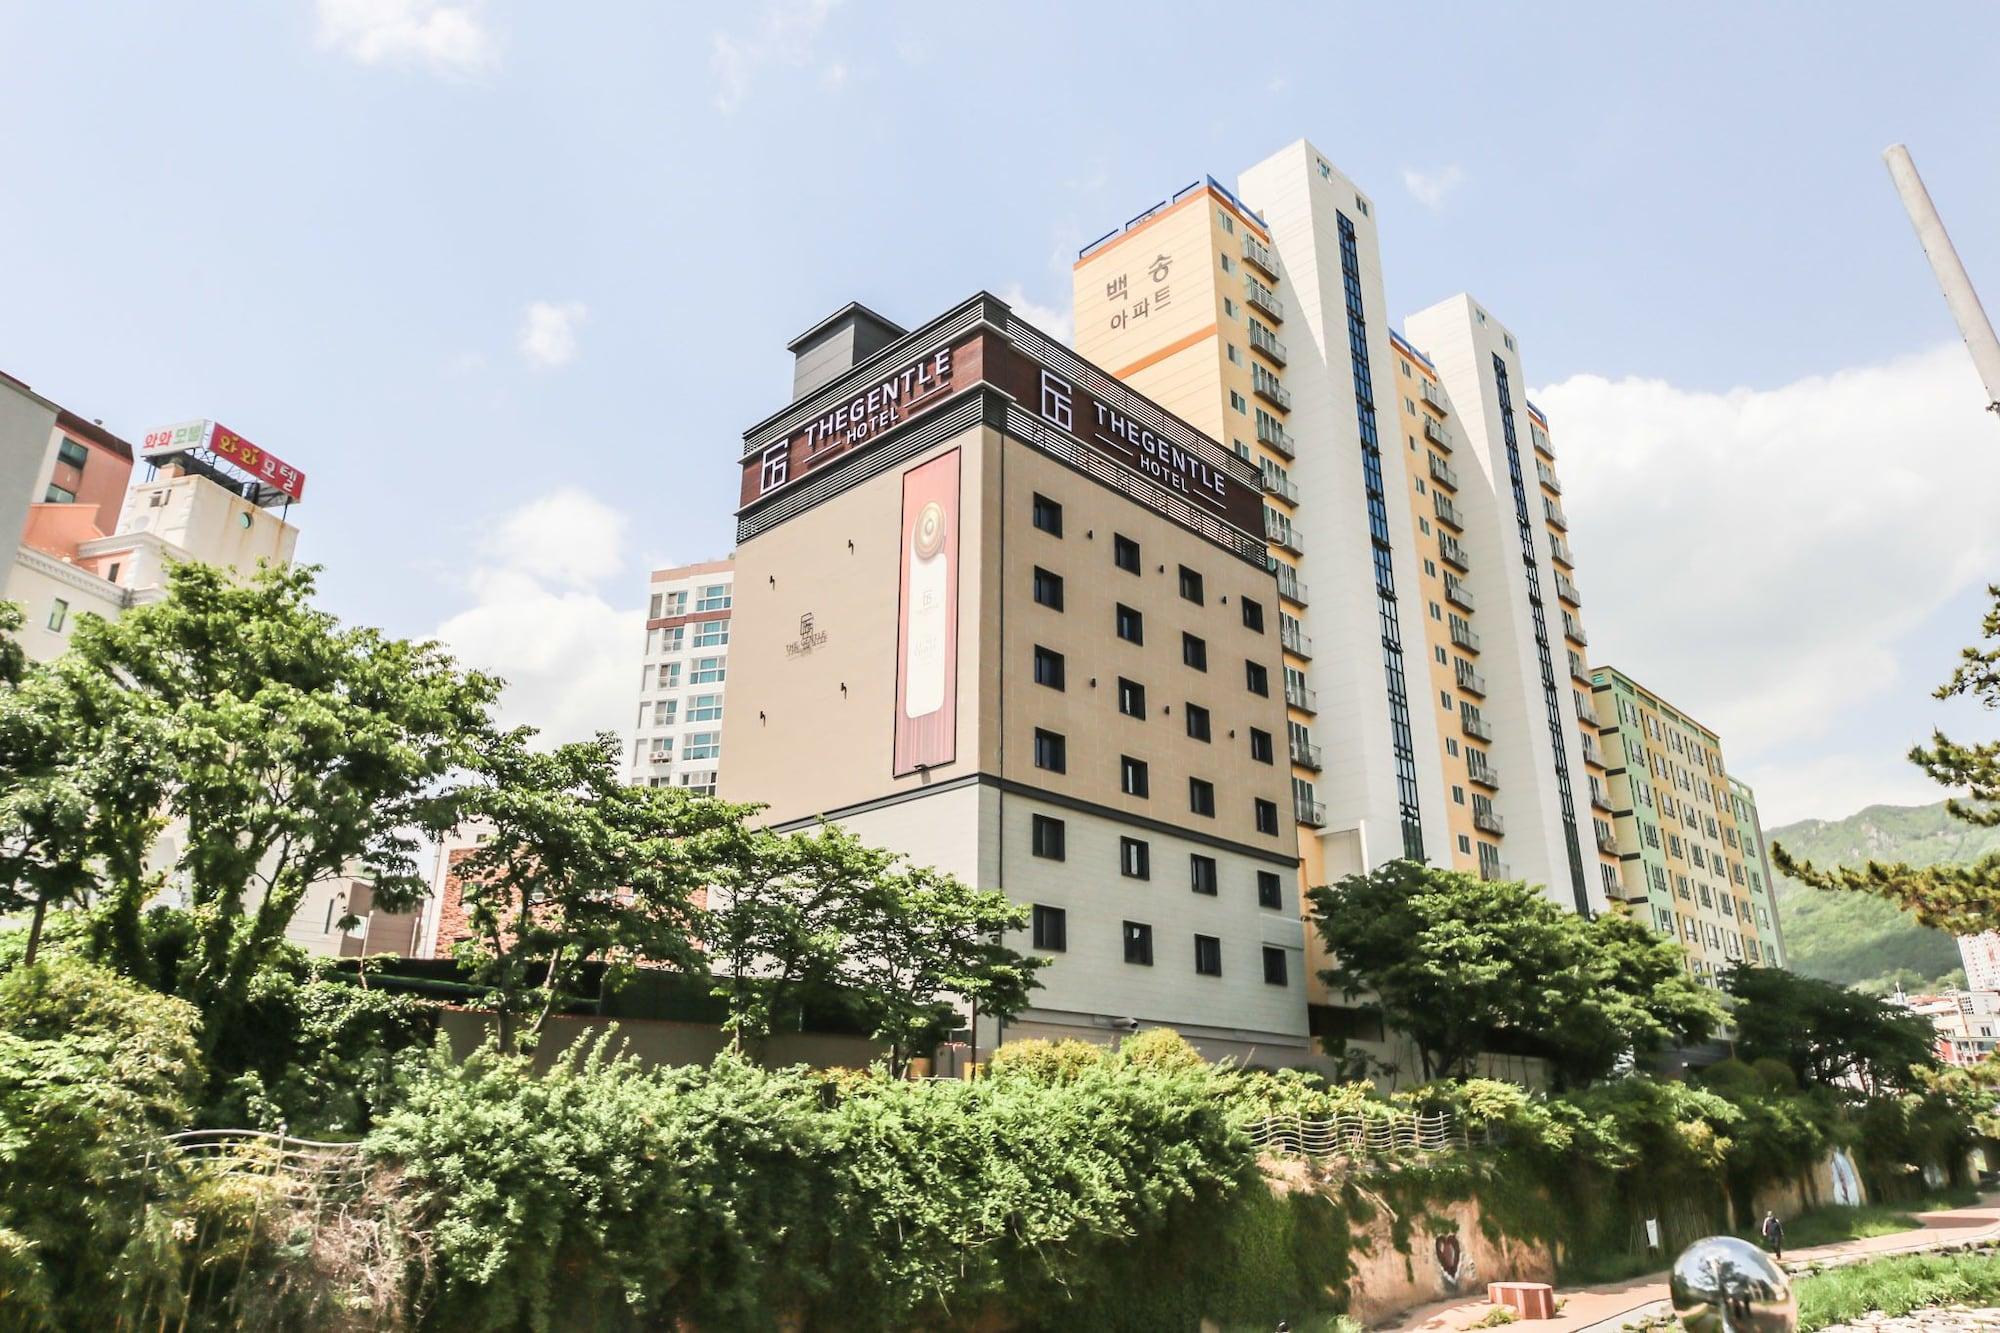 The Gentle Hotel